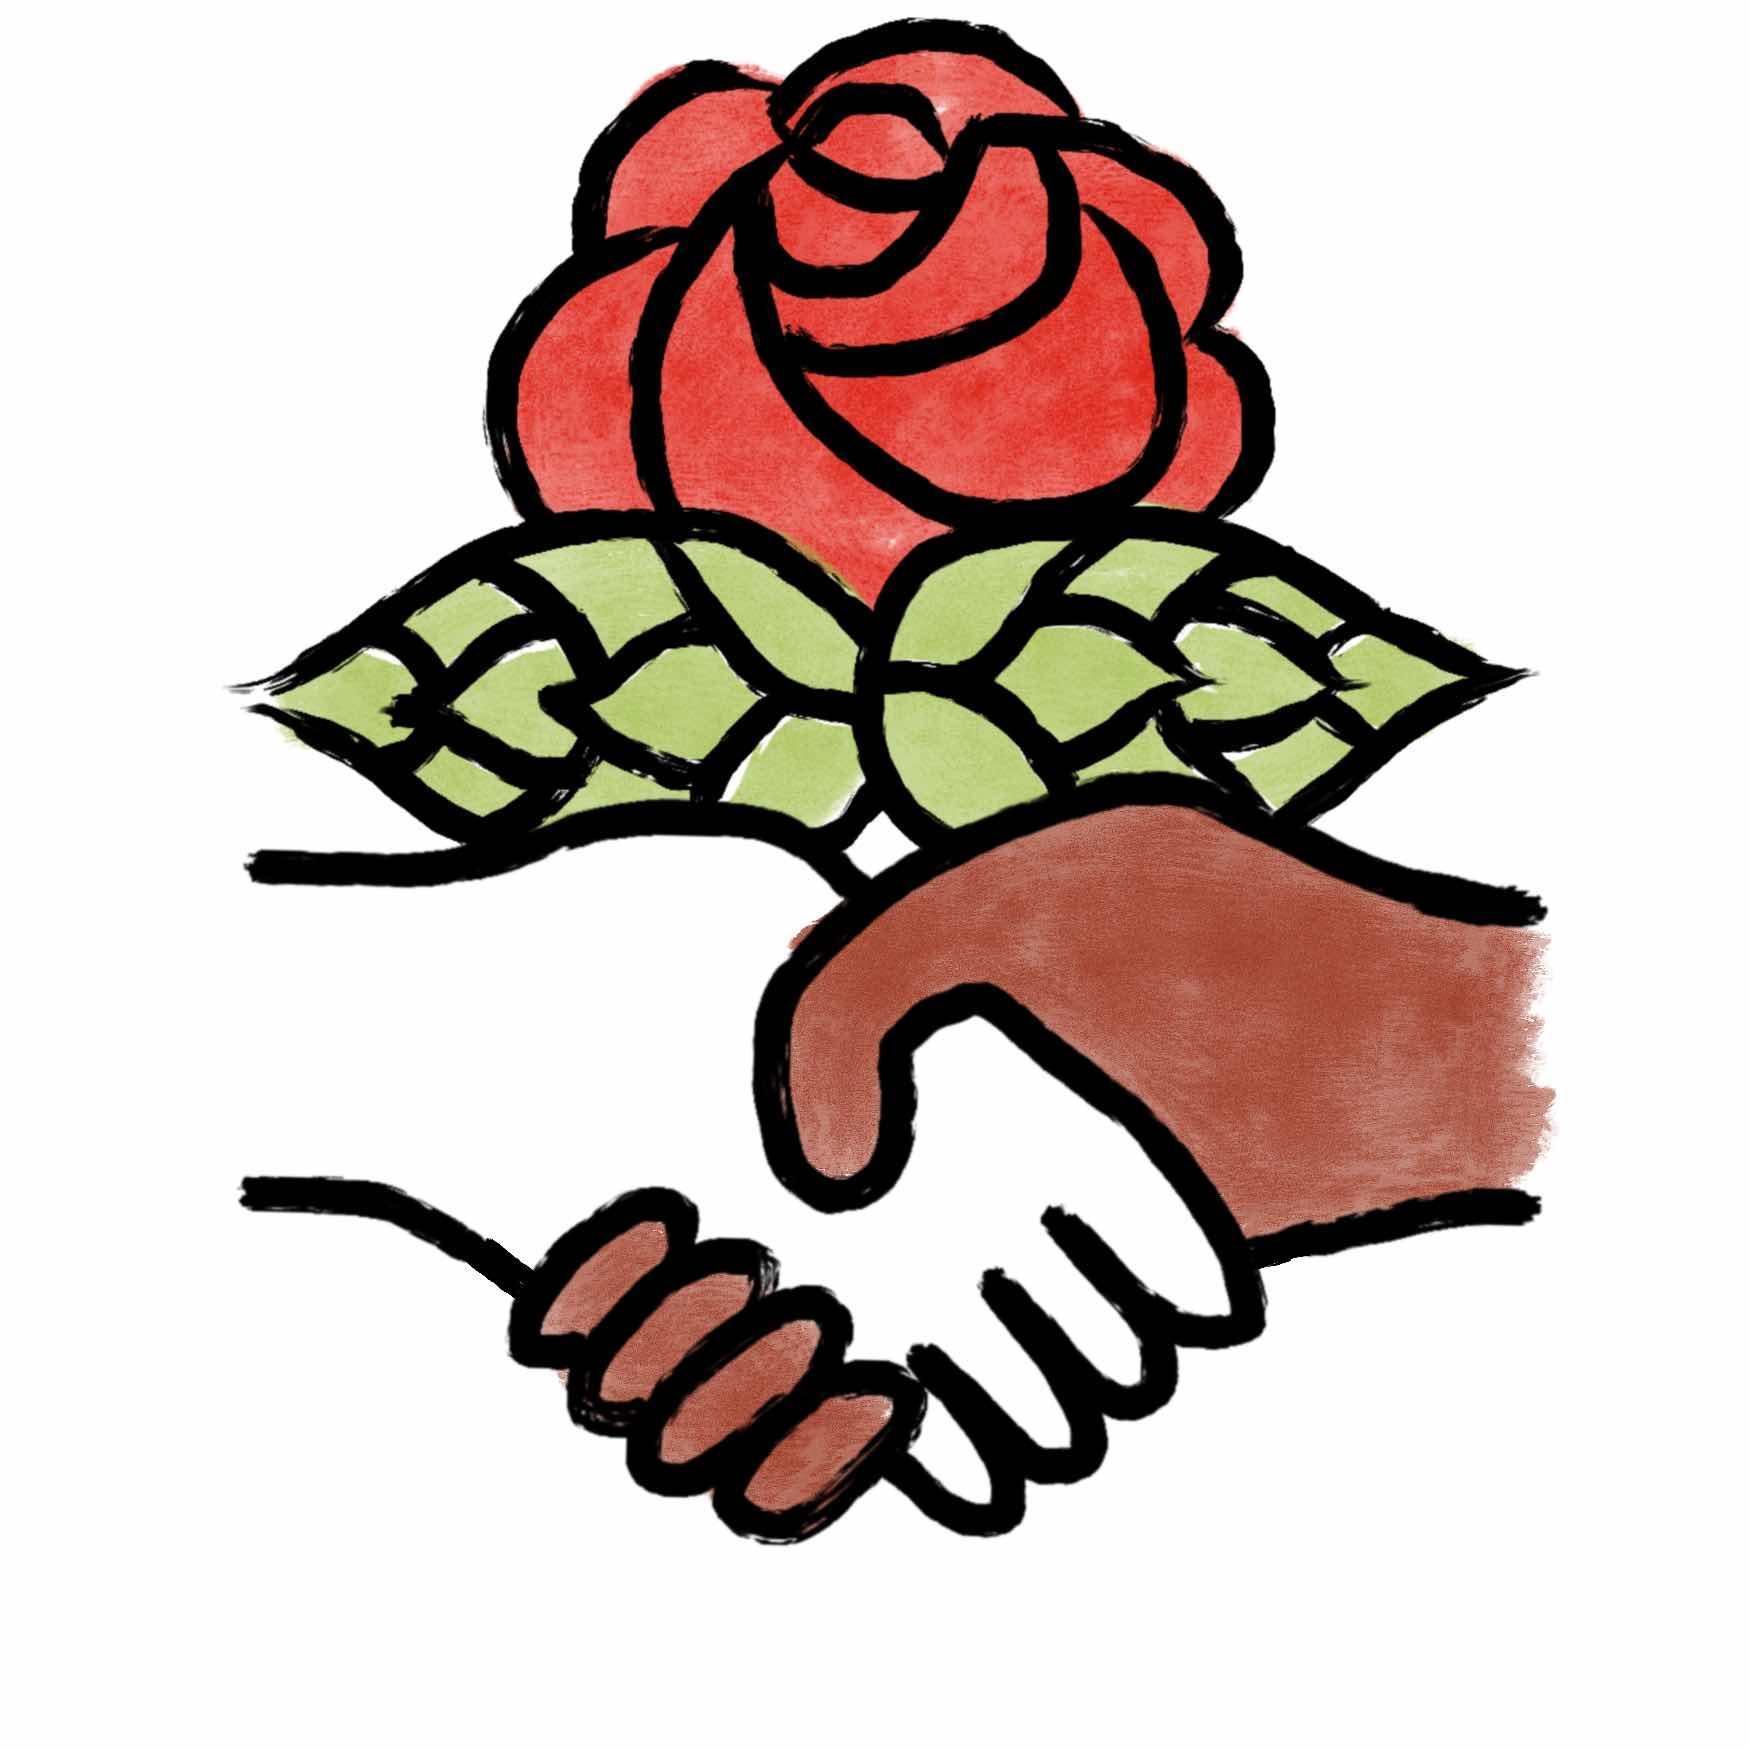 Fort Collins DSA 🌹 Fort Collins Democratic Socialists of America